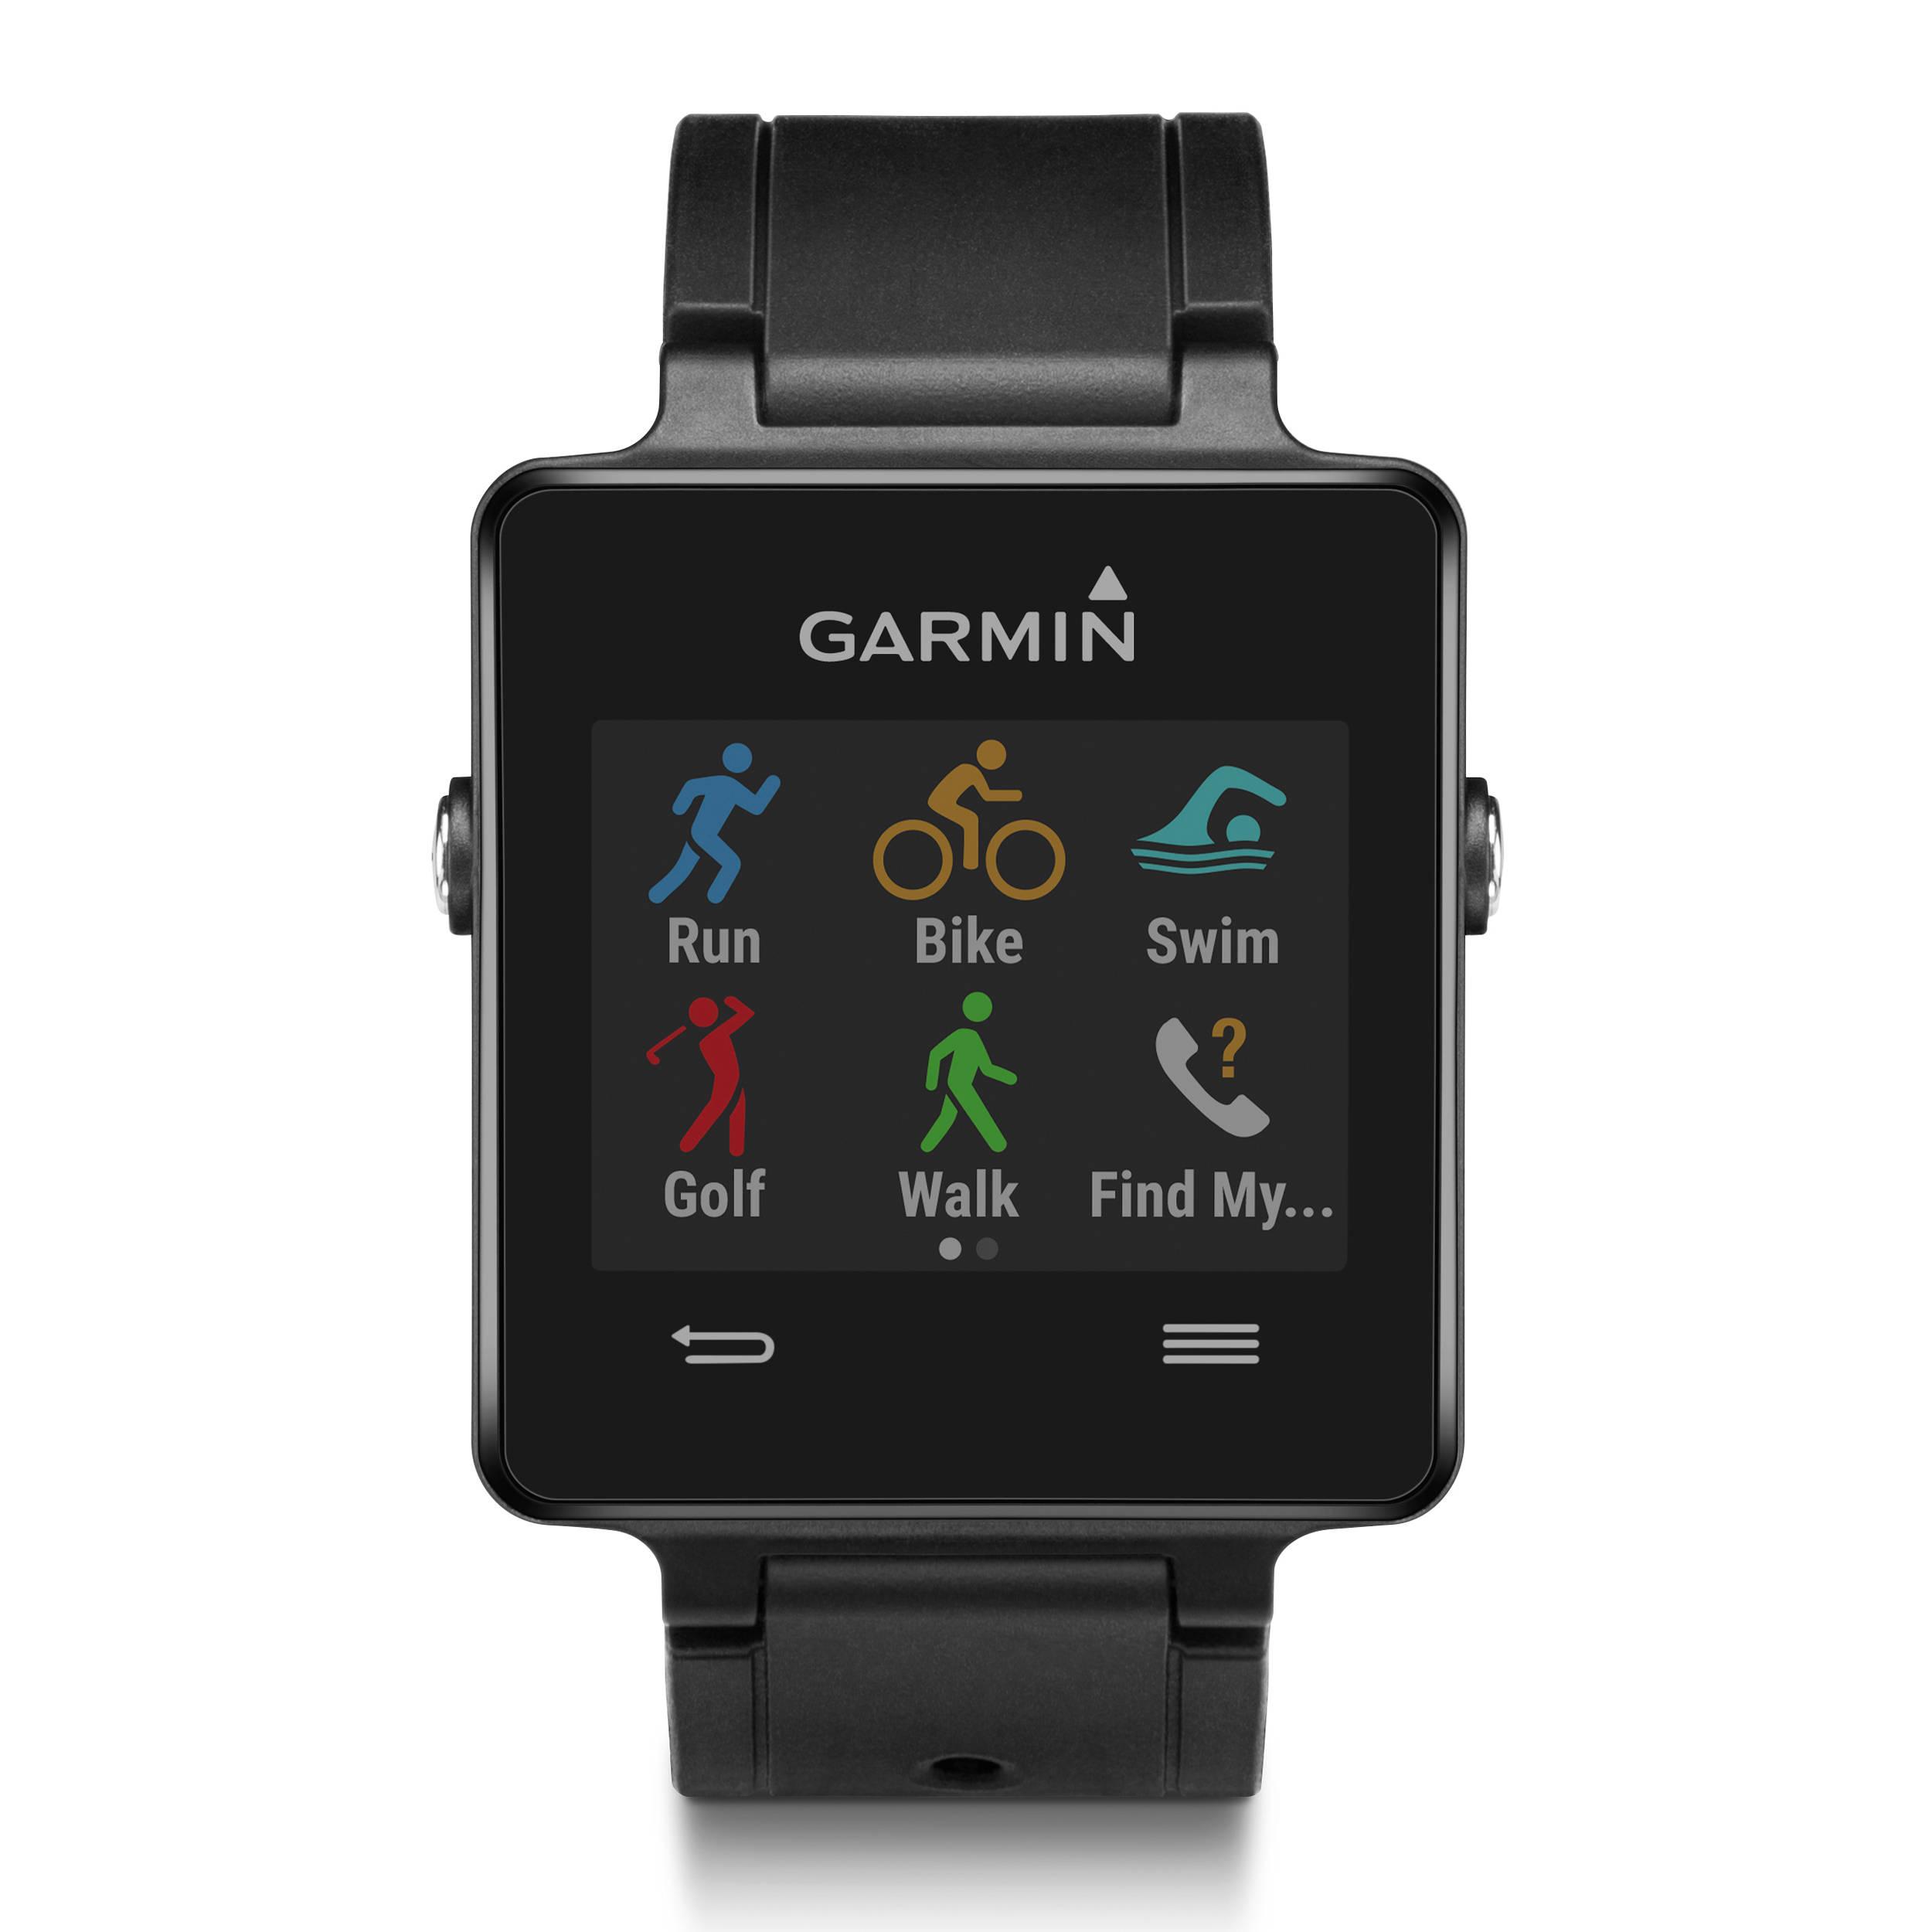 Garmin vivoactive Sport Watch with Heart Rate 010-01297-10 B&H